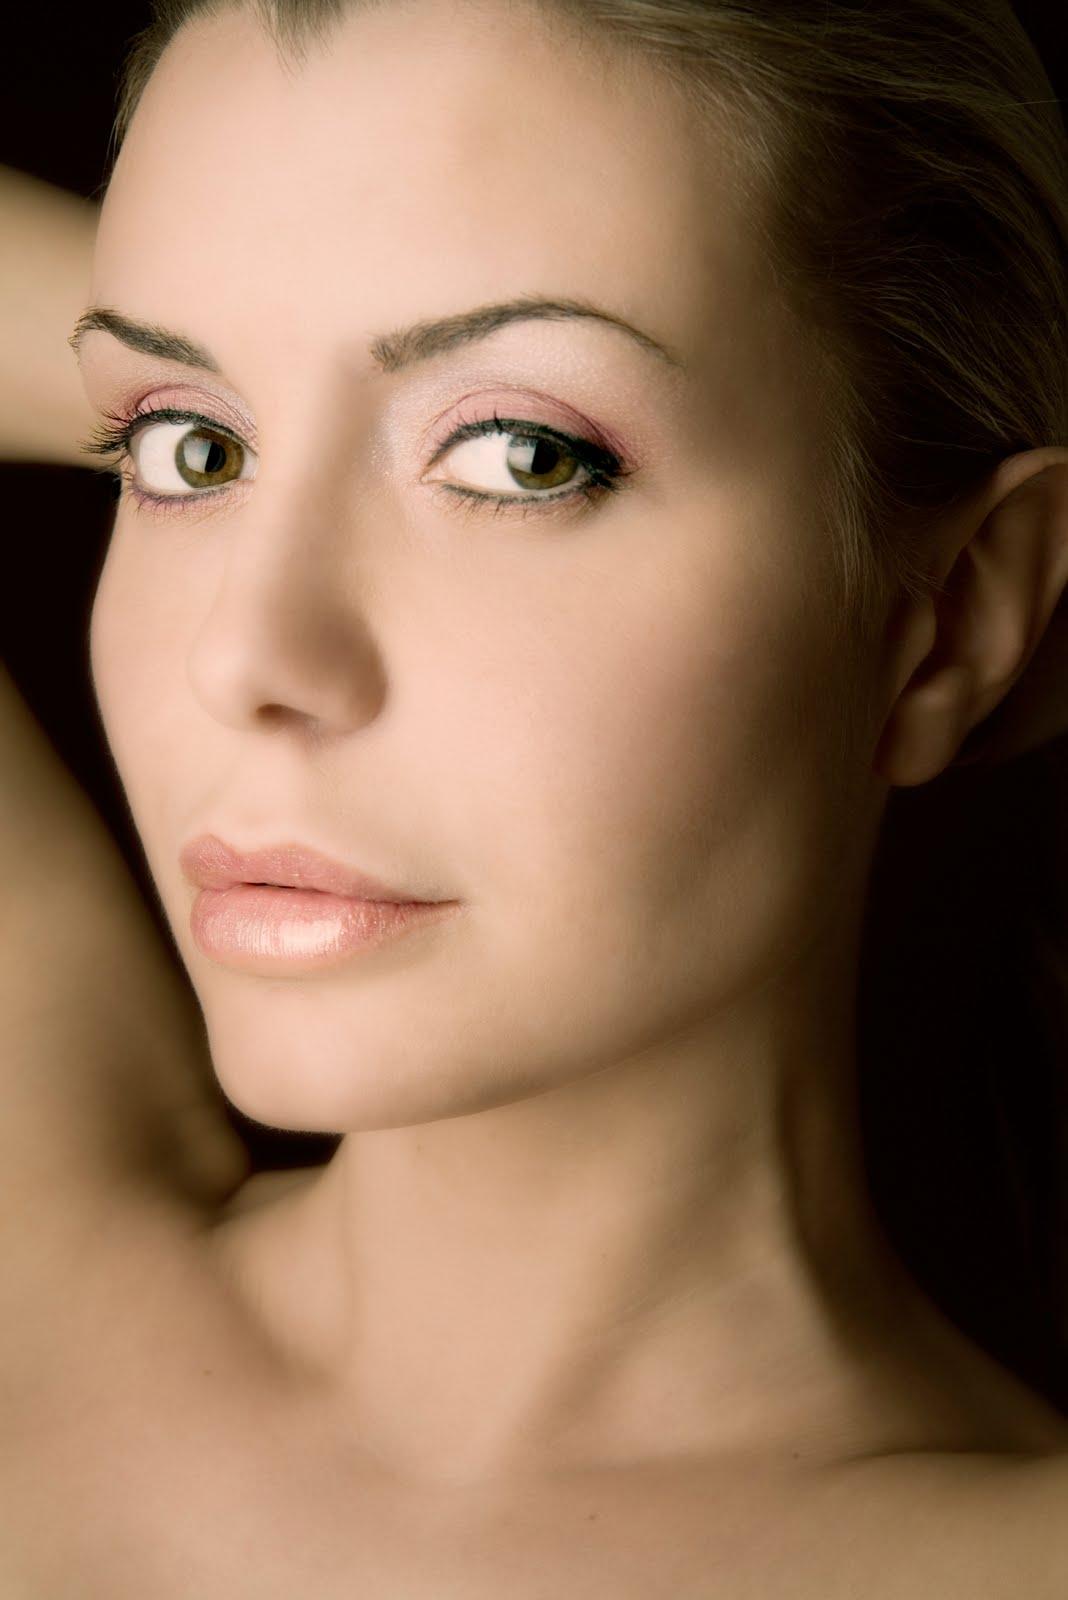 Top 20 Most beautiful Greek women - YouTube